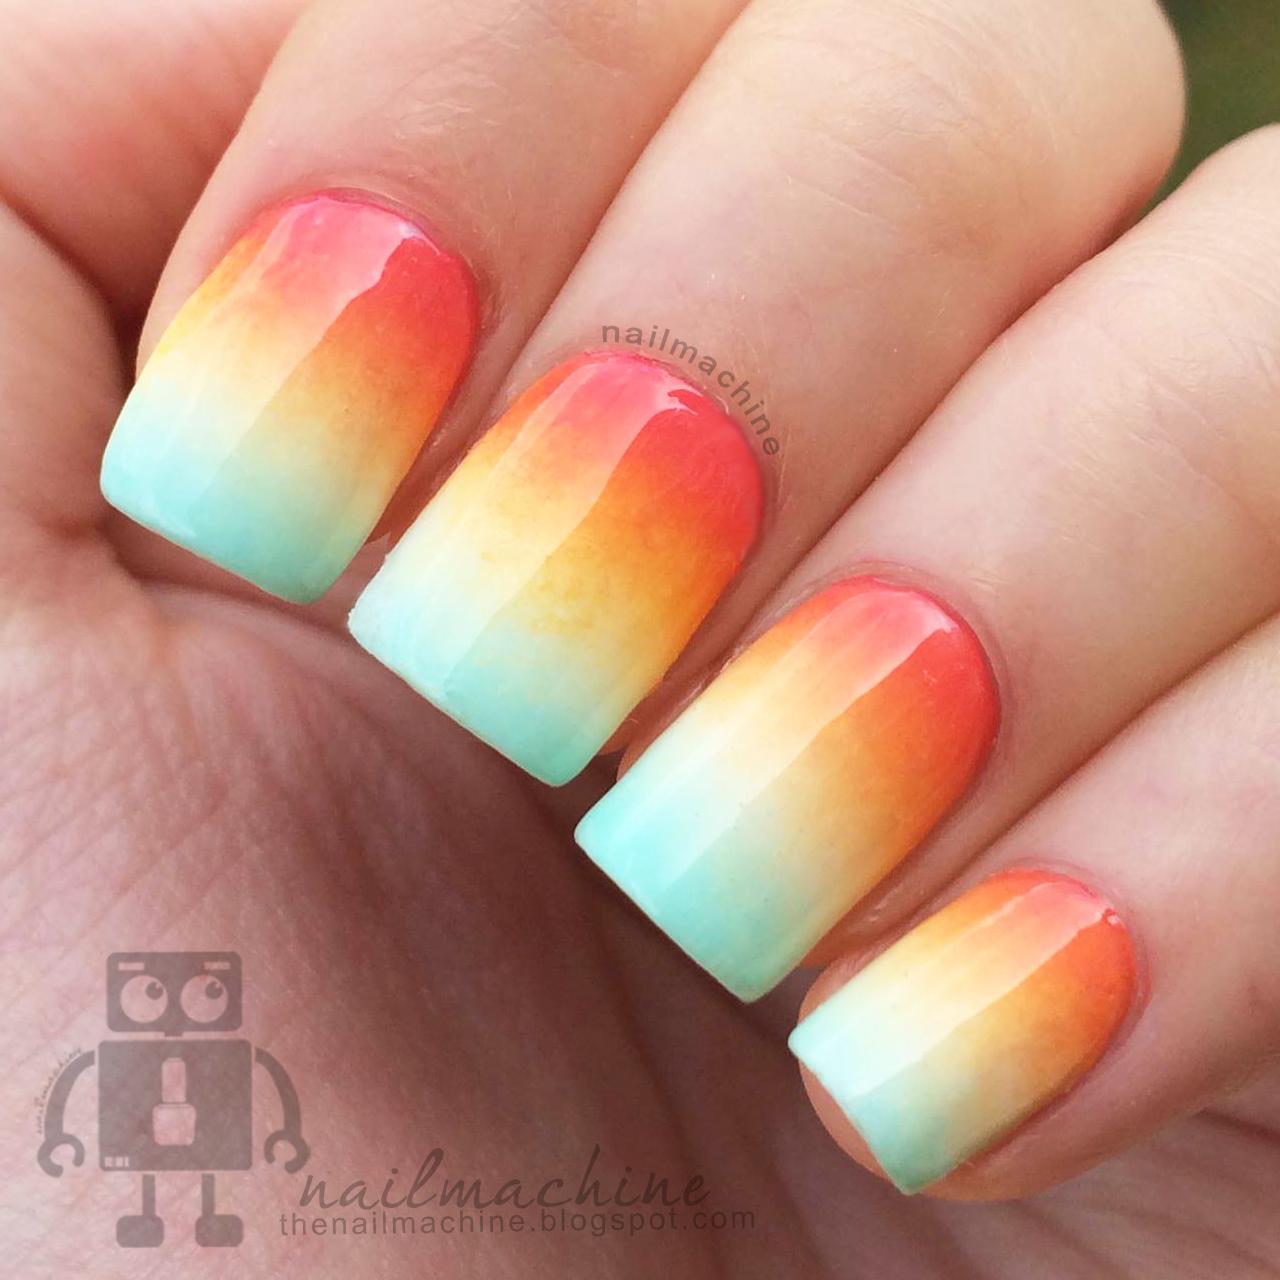 Cute Acrylic Nail Designs Tumblr | Joy Studio Design ...